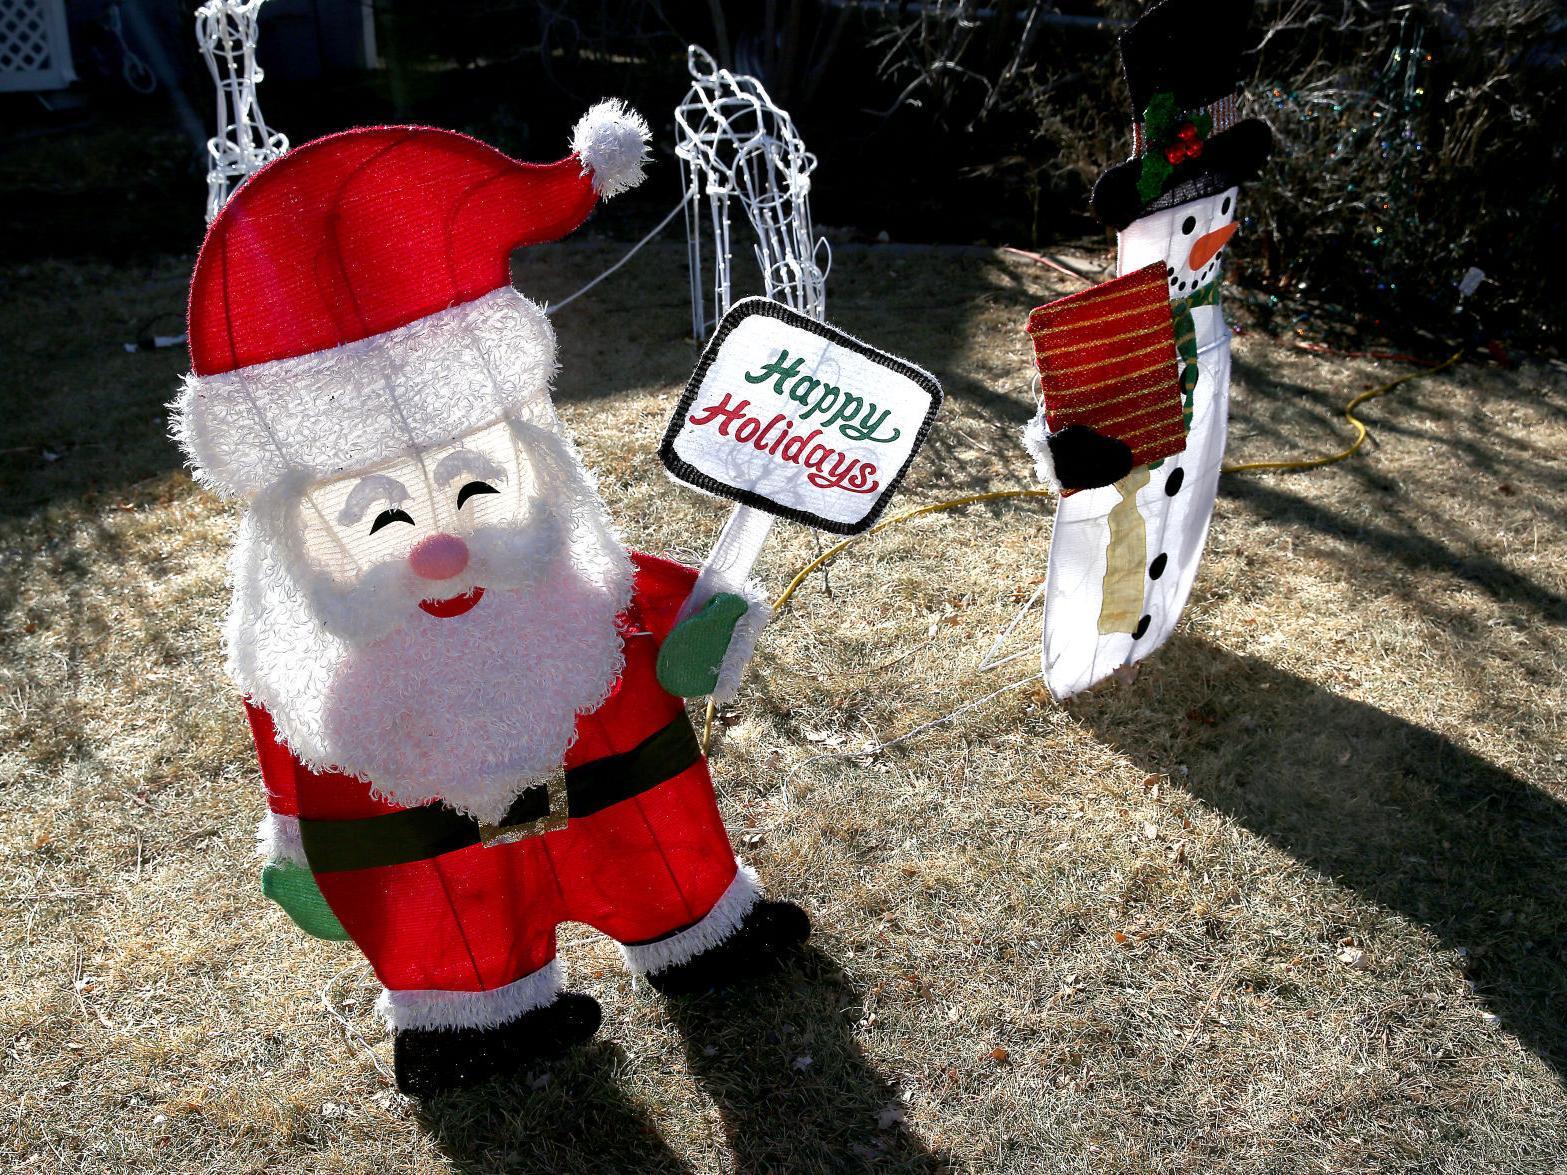 Flagstaff Christmas 2021